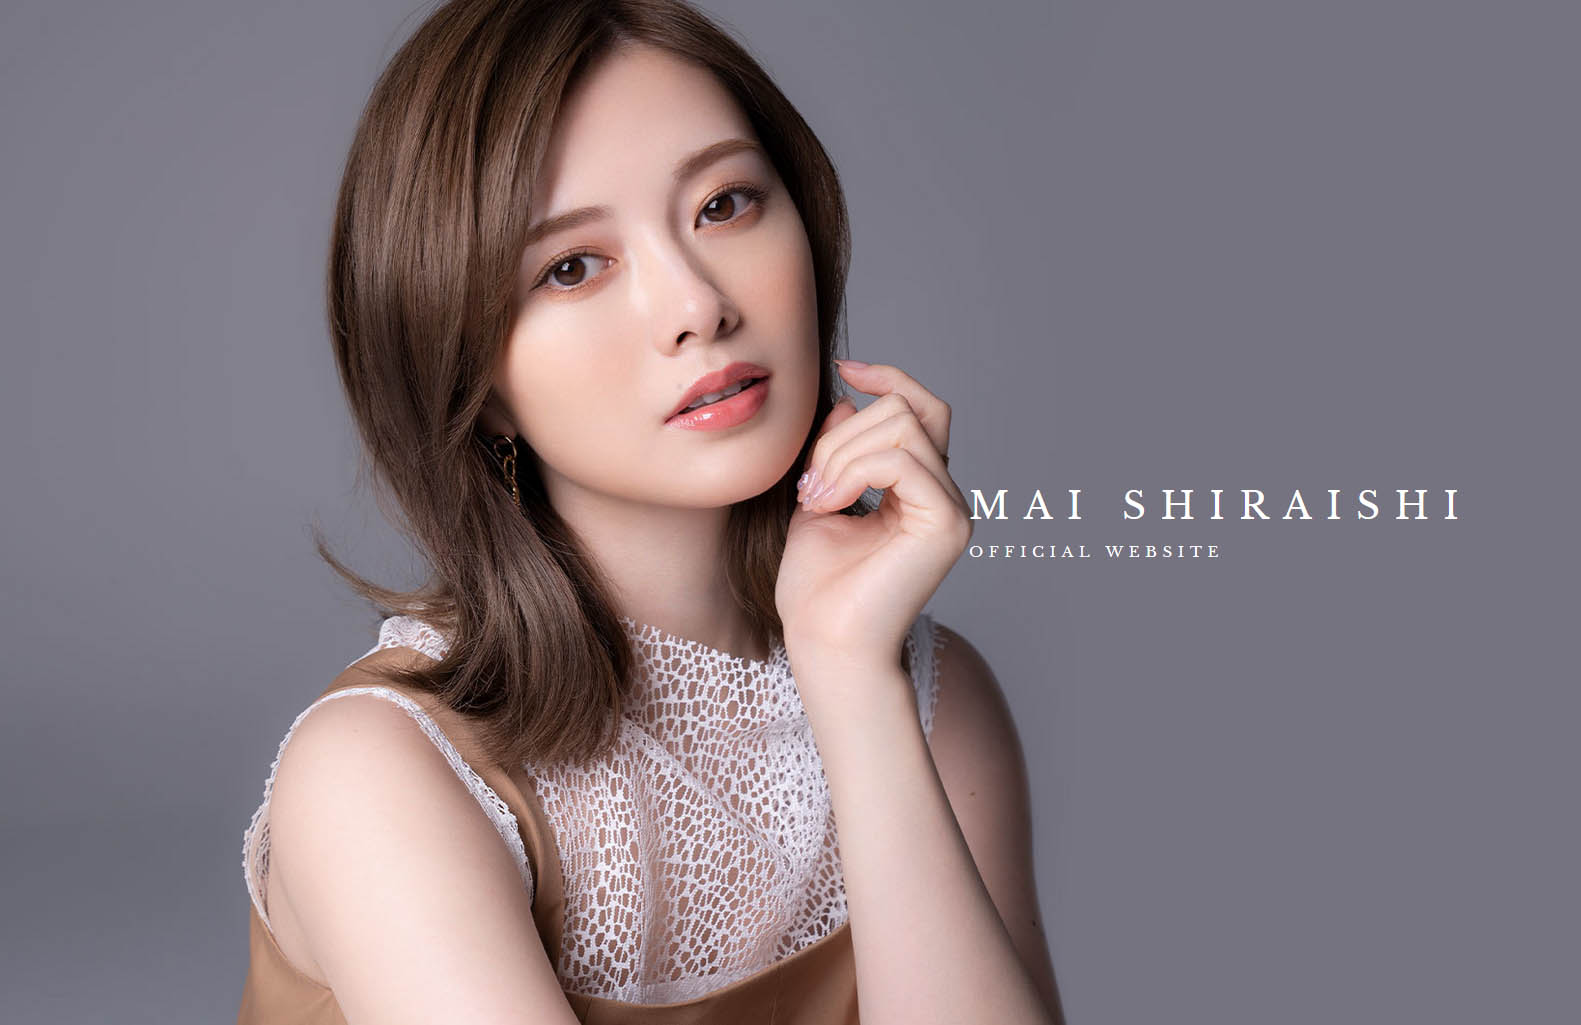 MShiraishi Site 02.jpg